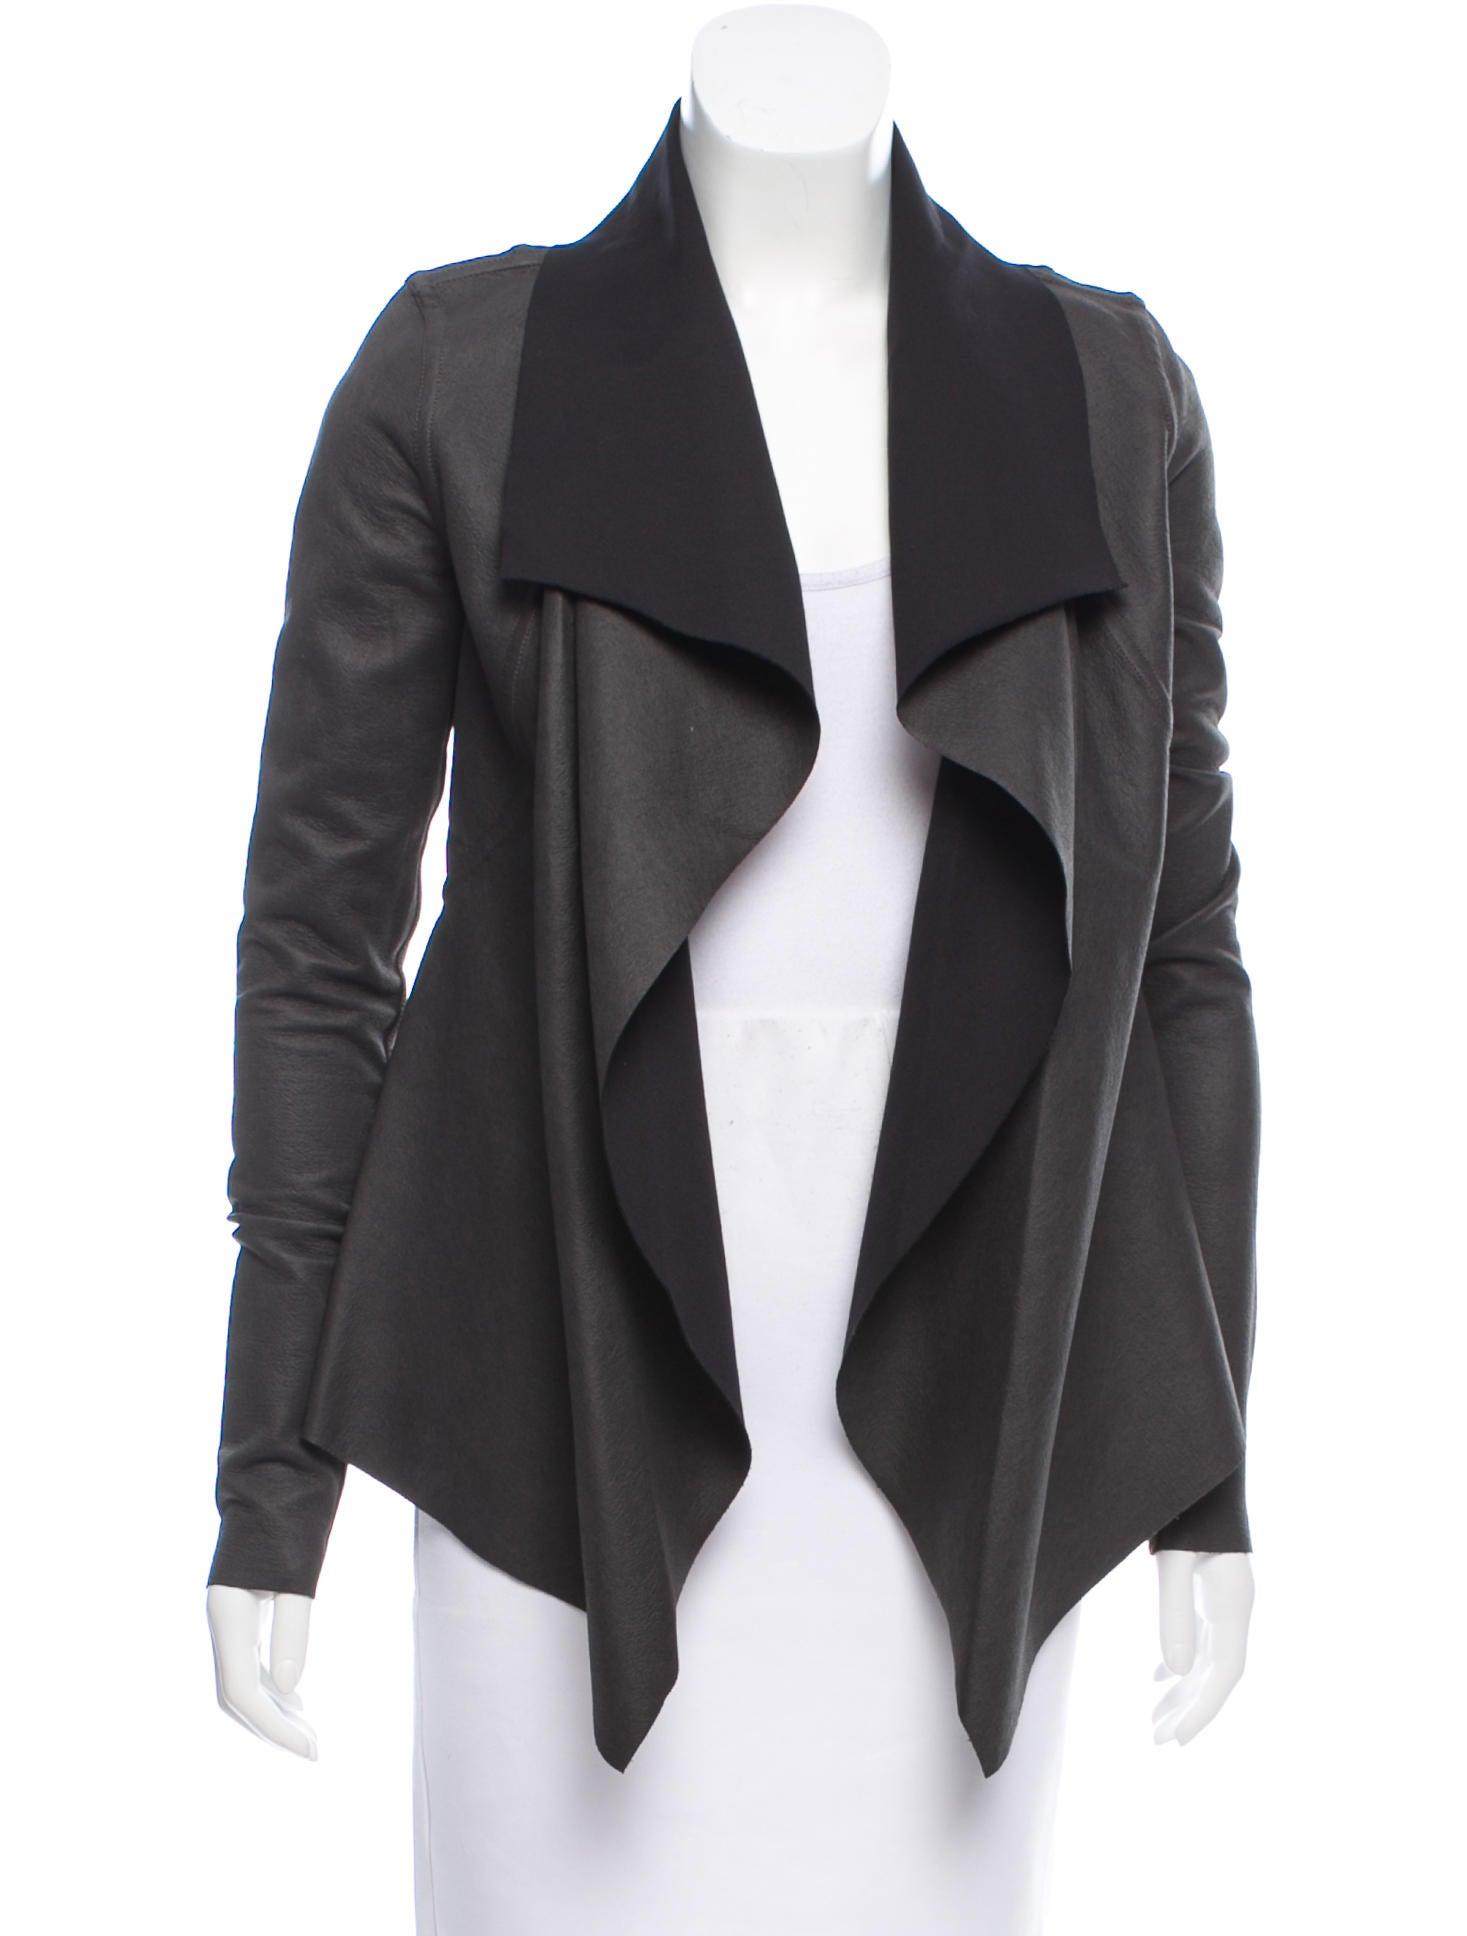 silkspandex demeulemeester ann size drapes spring jacket silk i tie draped spandex dress black wrap l